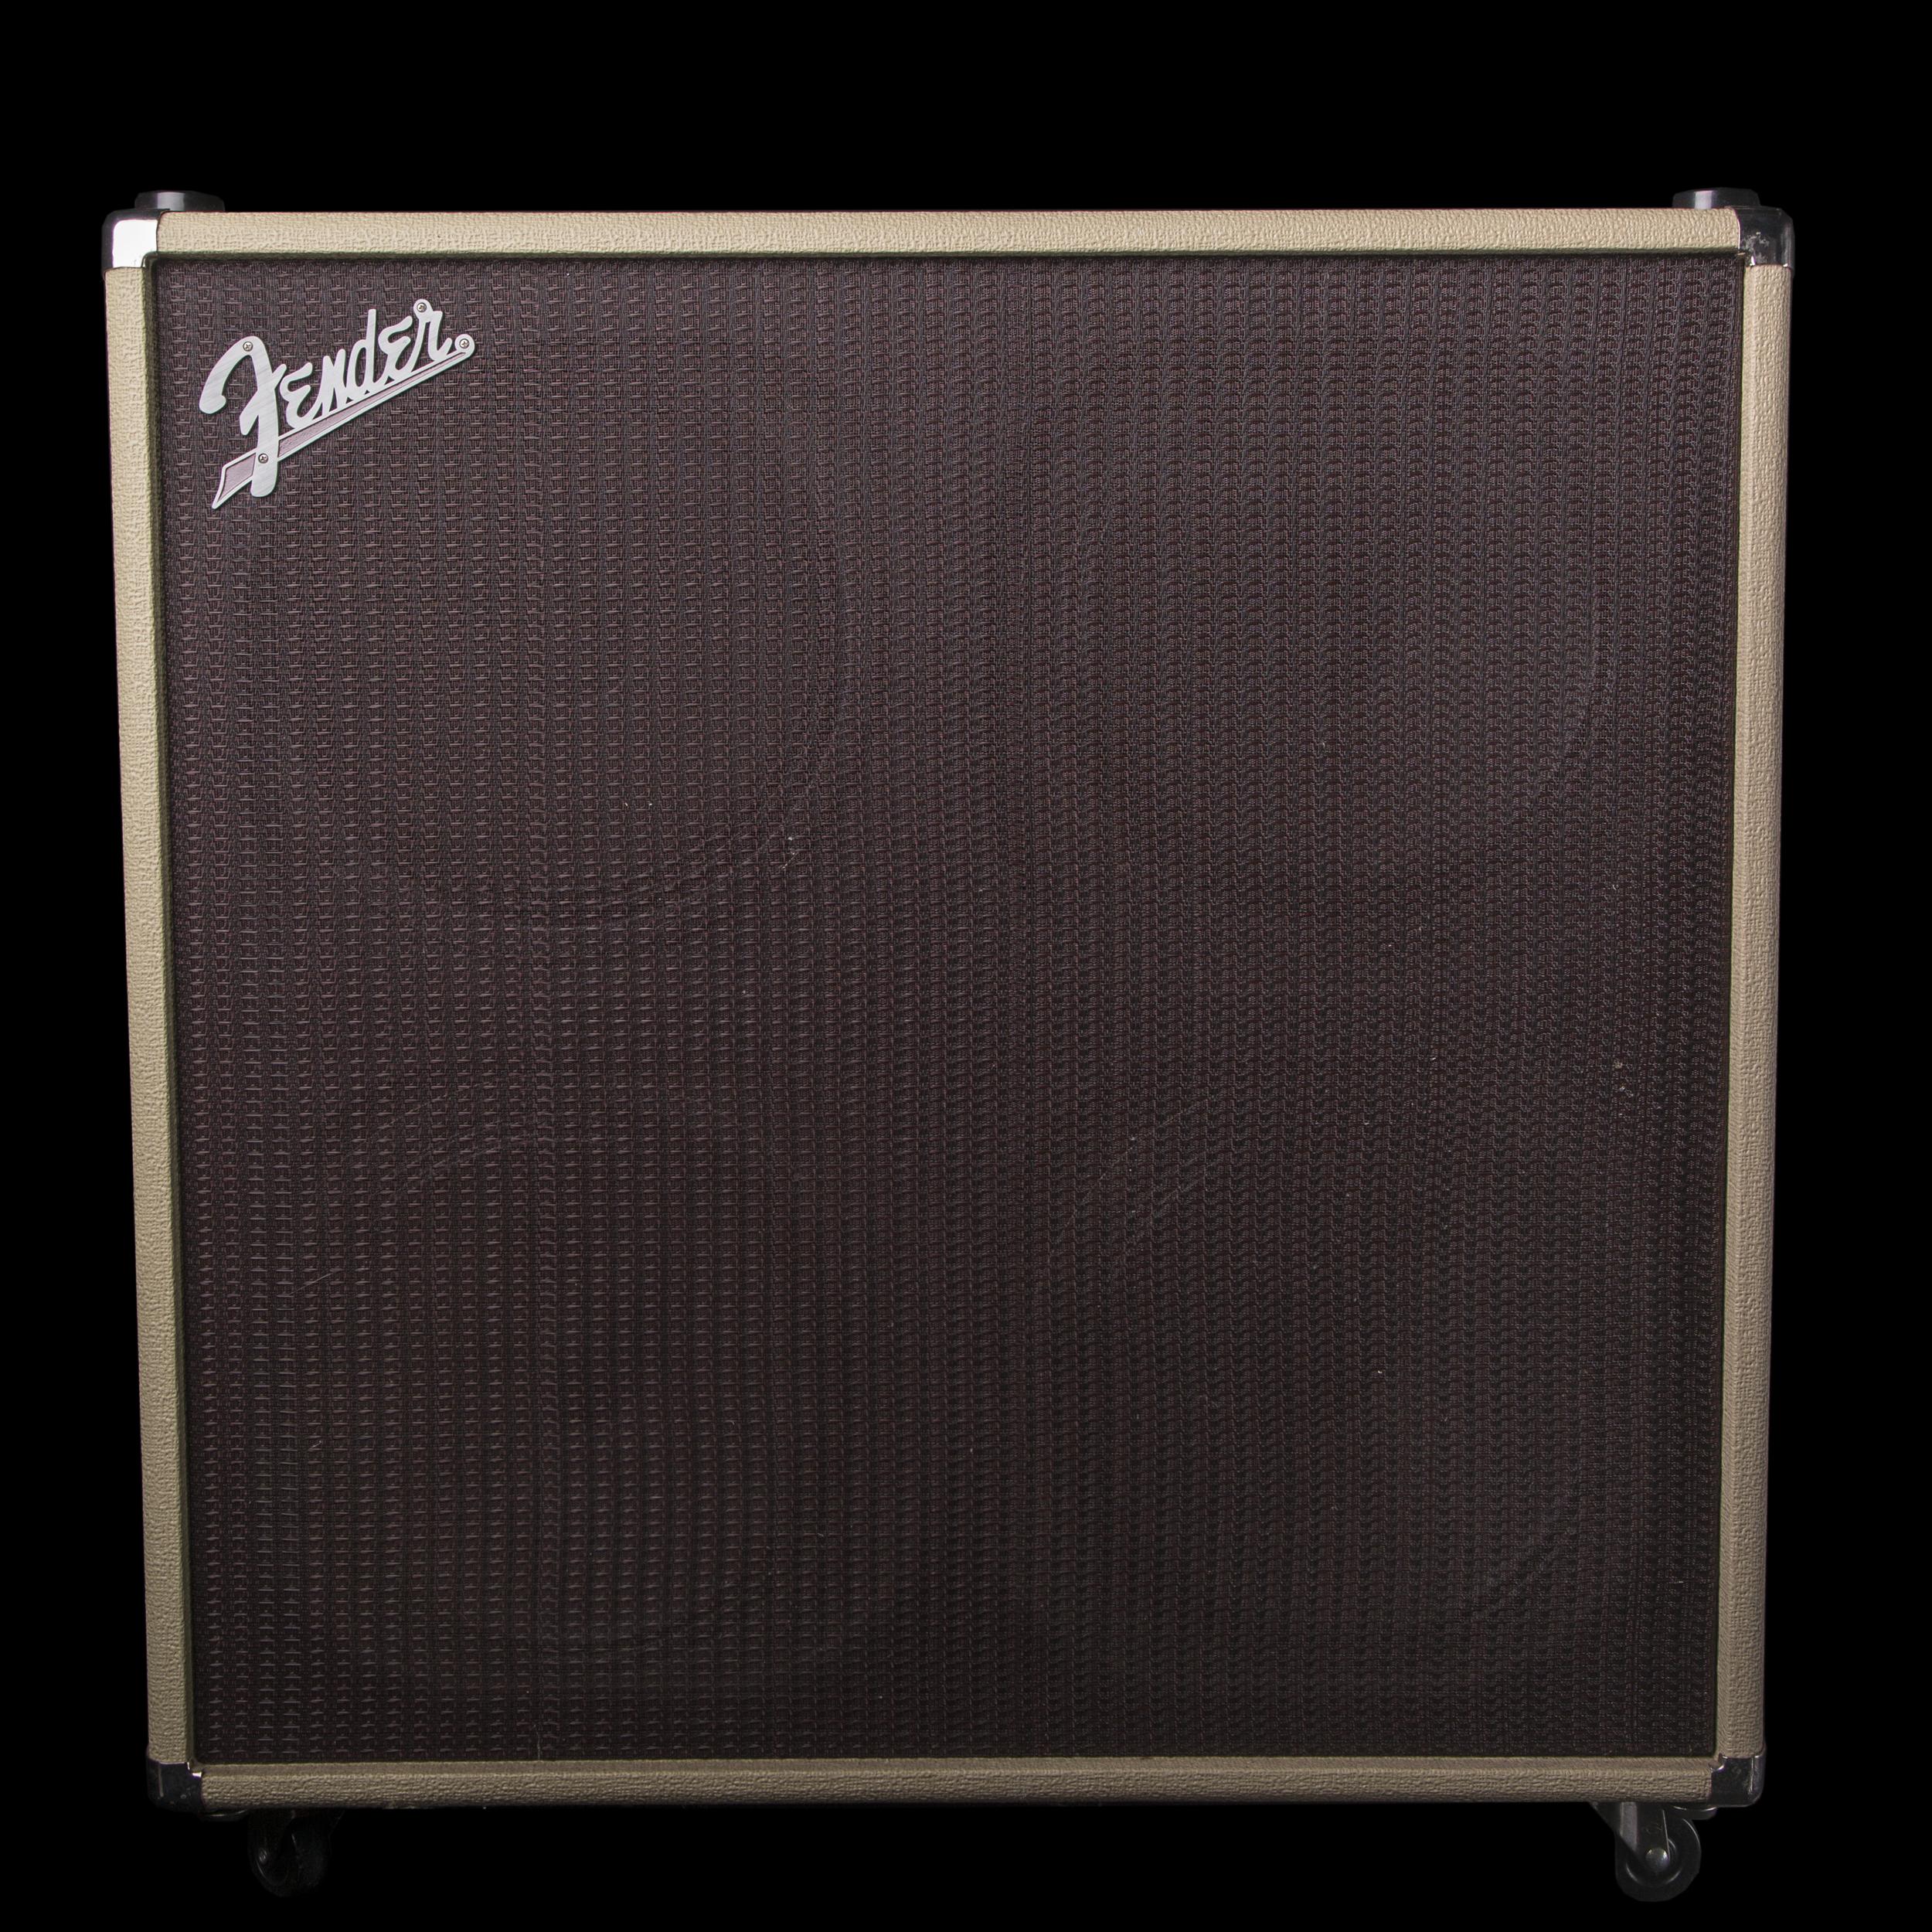 Fender 4x10 Guitar Cabinet Fender Super Sonic 100 4x12 Cabinet